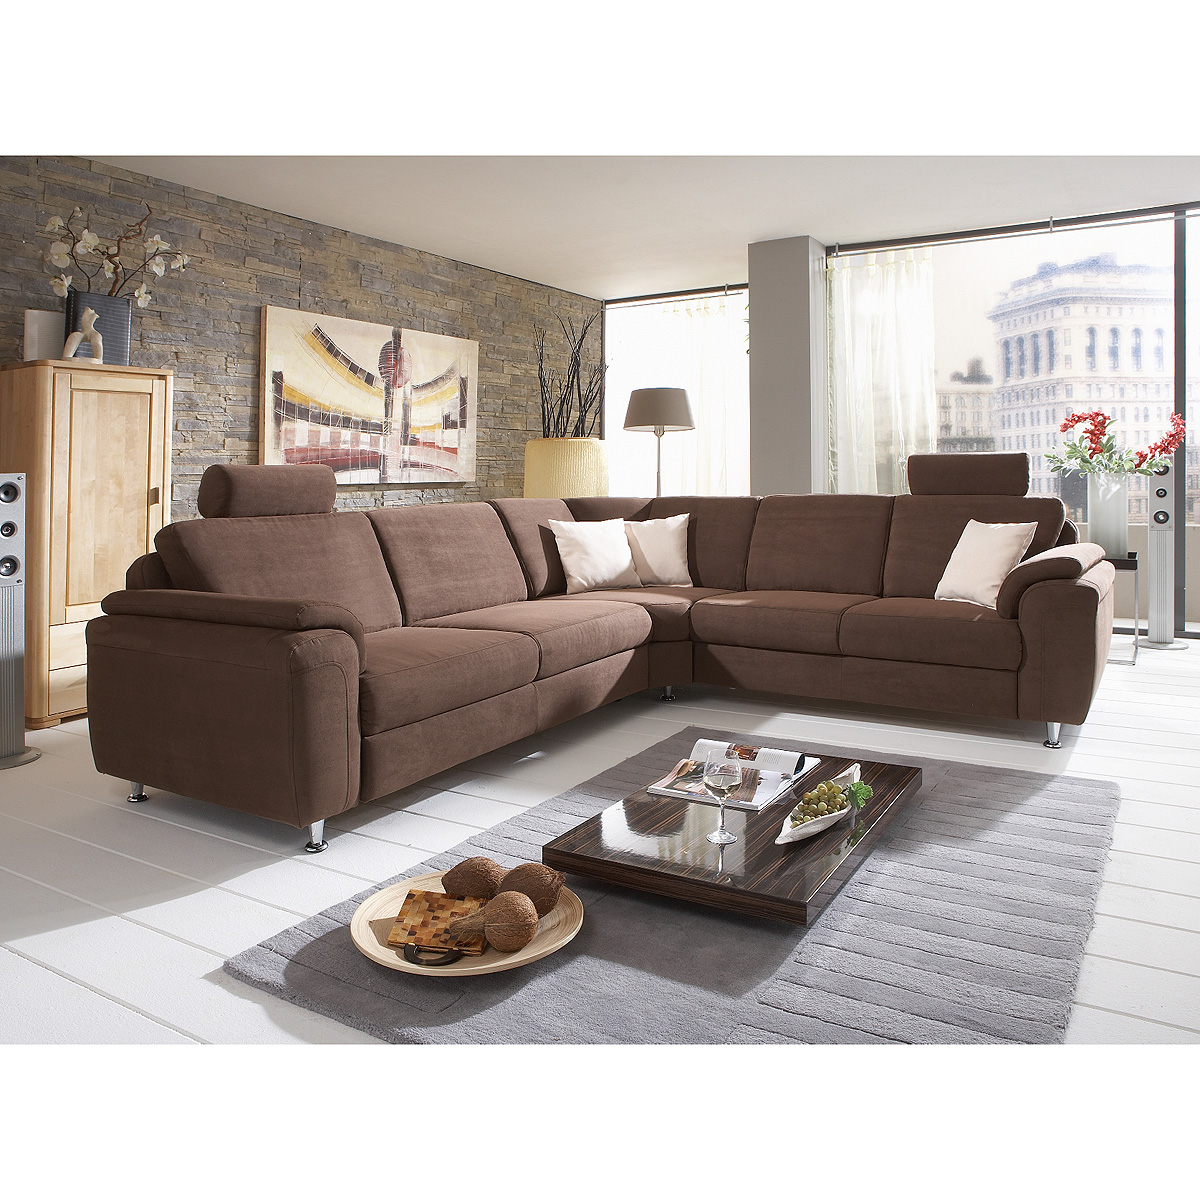 ecksofa oxfort wohnlandschaft sofa polsterm bel stoff in braun 276x246 ebay. Black Bedroom Furniture Sets. Home Design Ideas